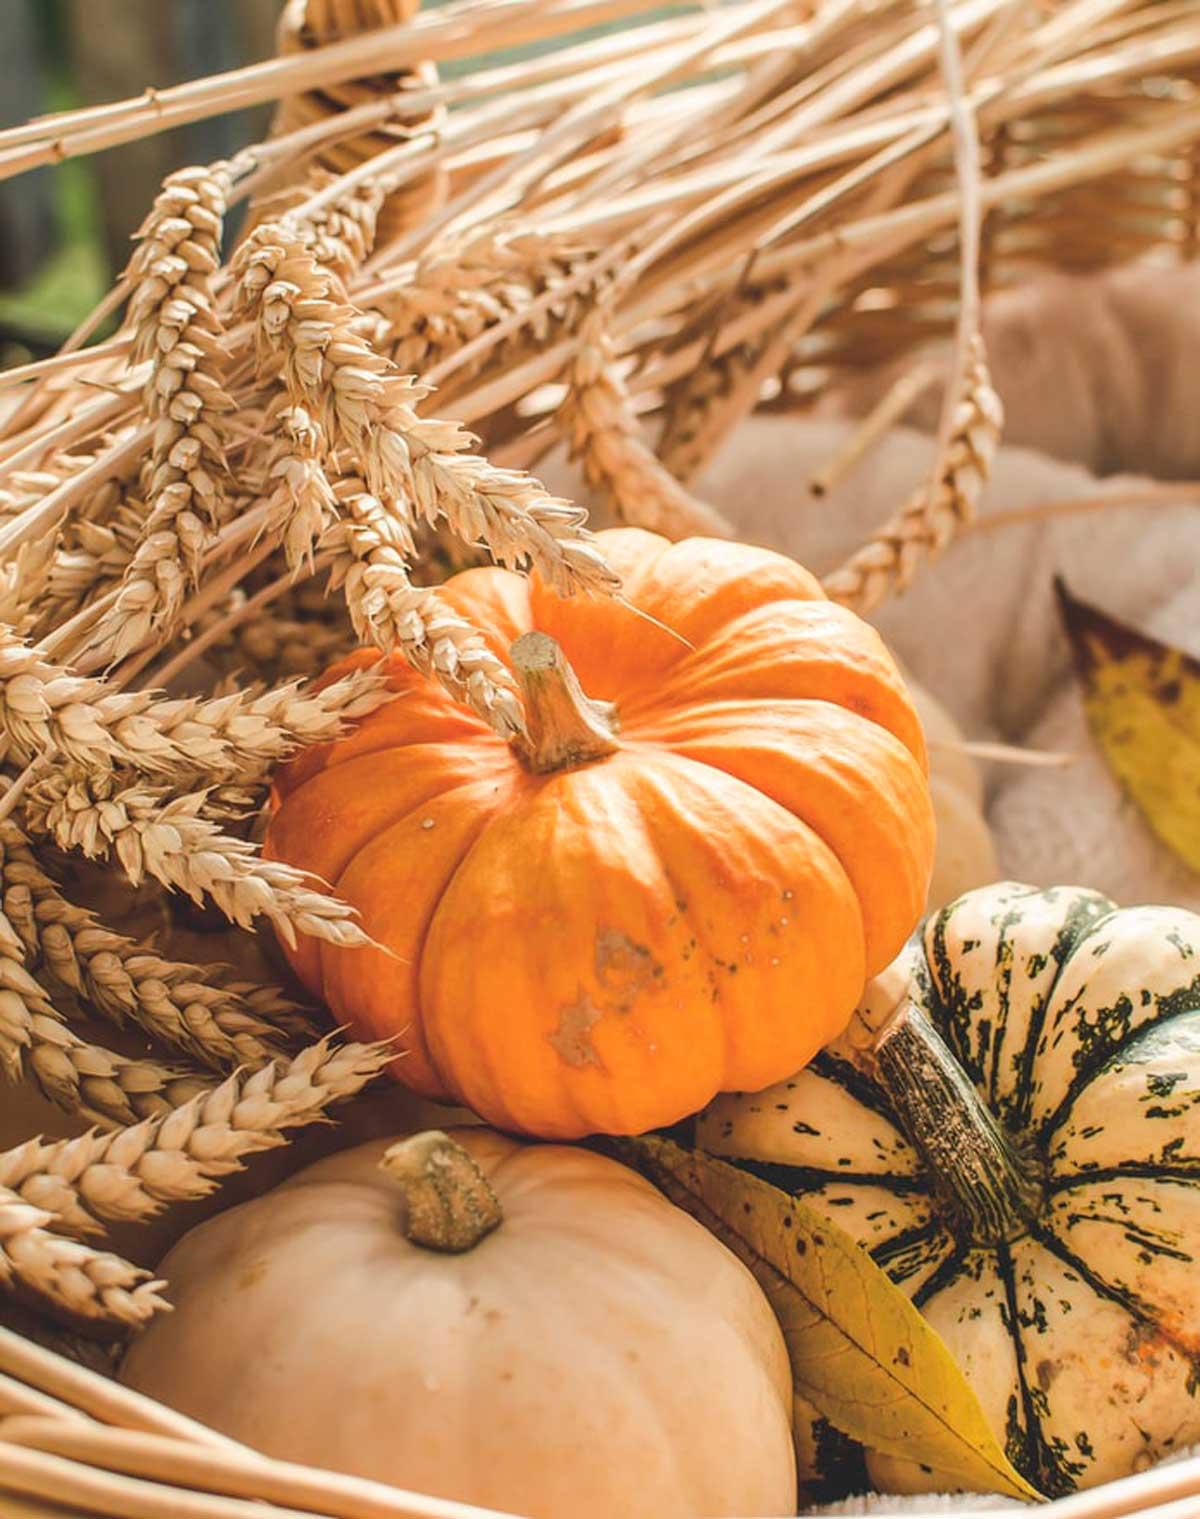 pumpkins-pumpkin-waste-loverovers-repurpose